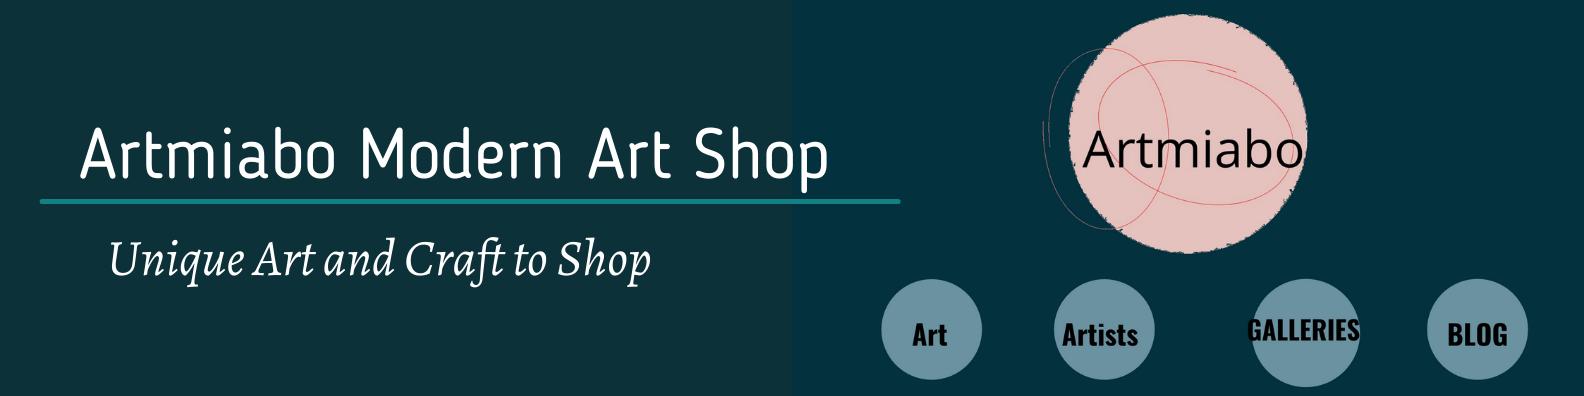 Artmiabo Modern Art  Shop